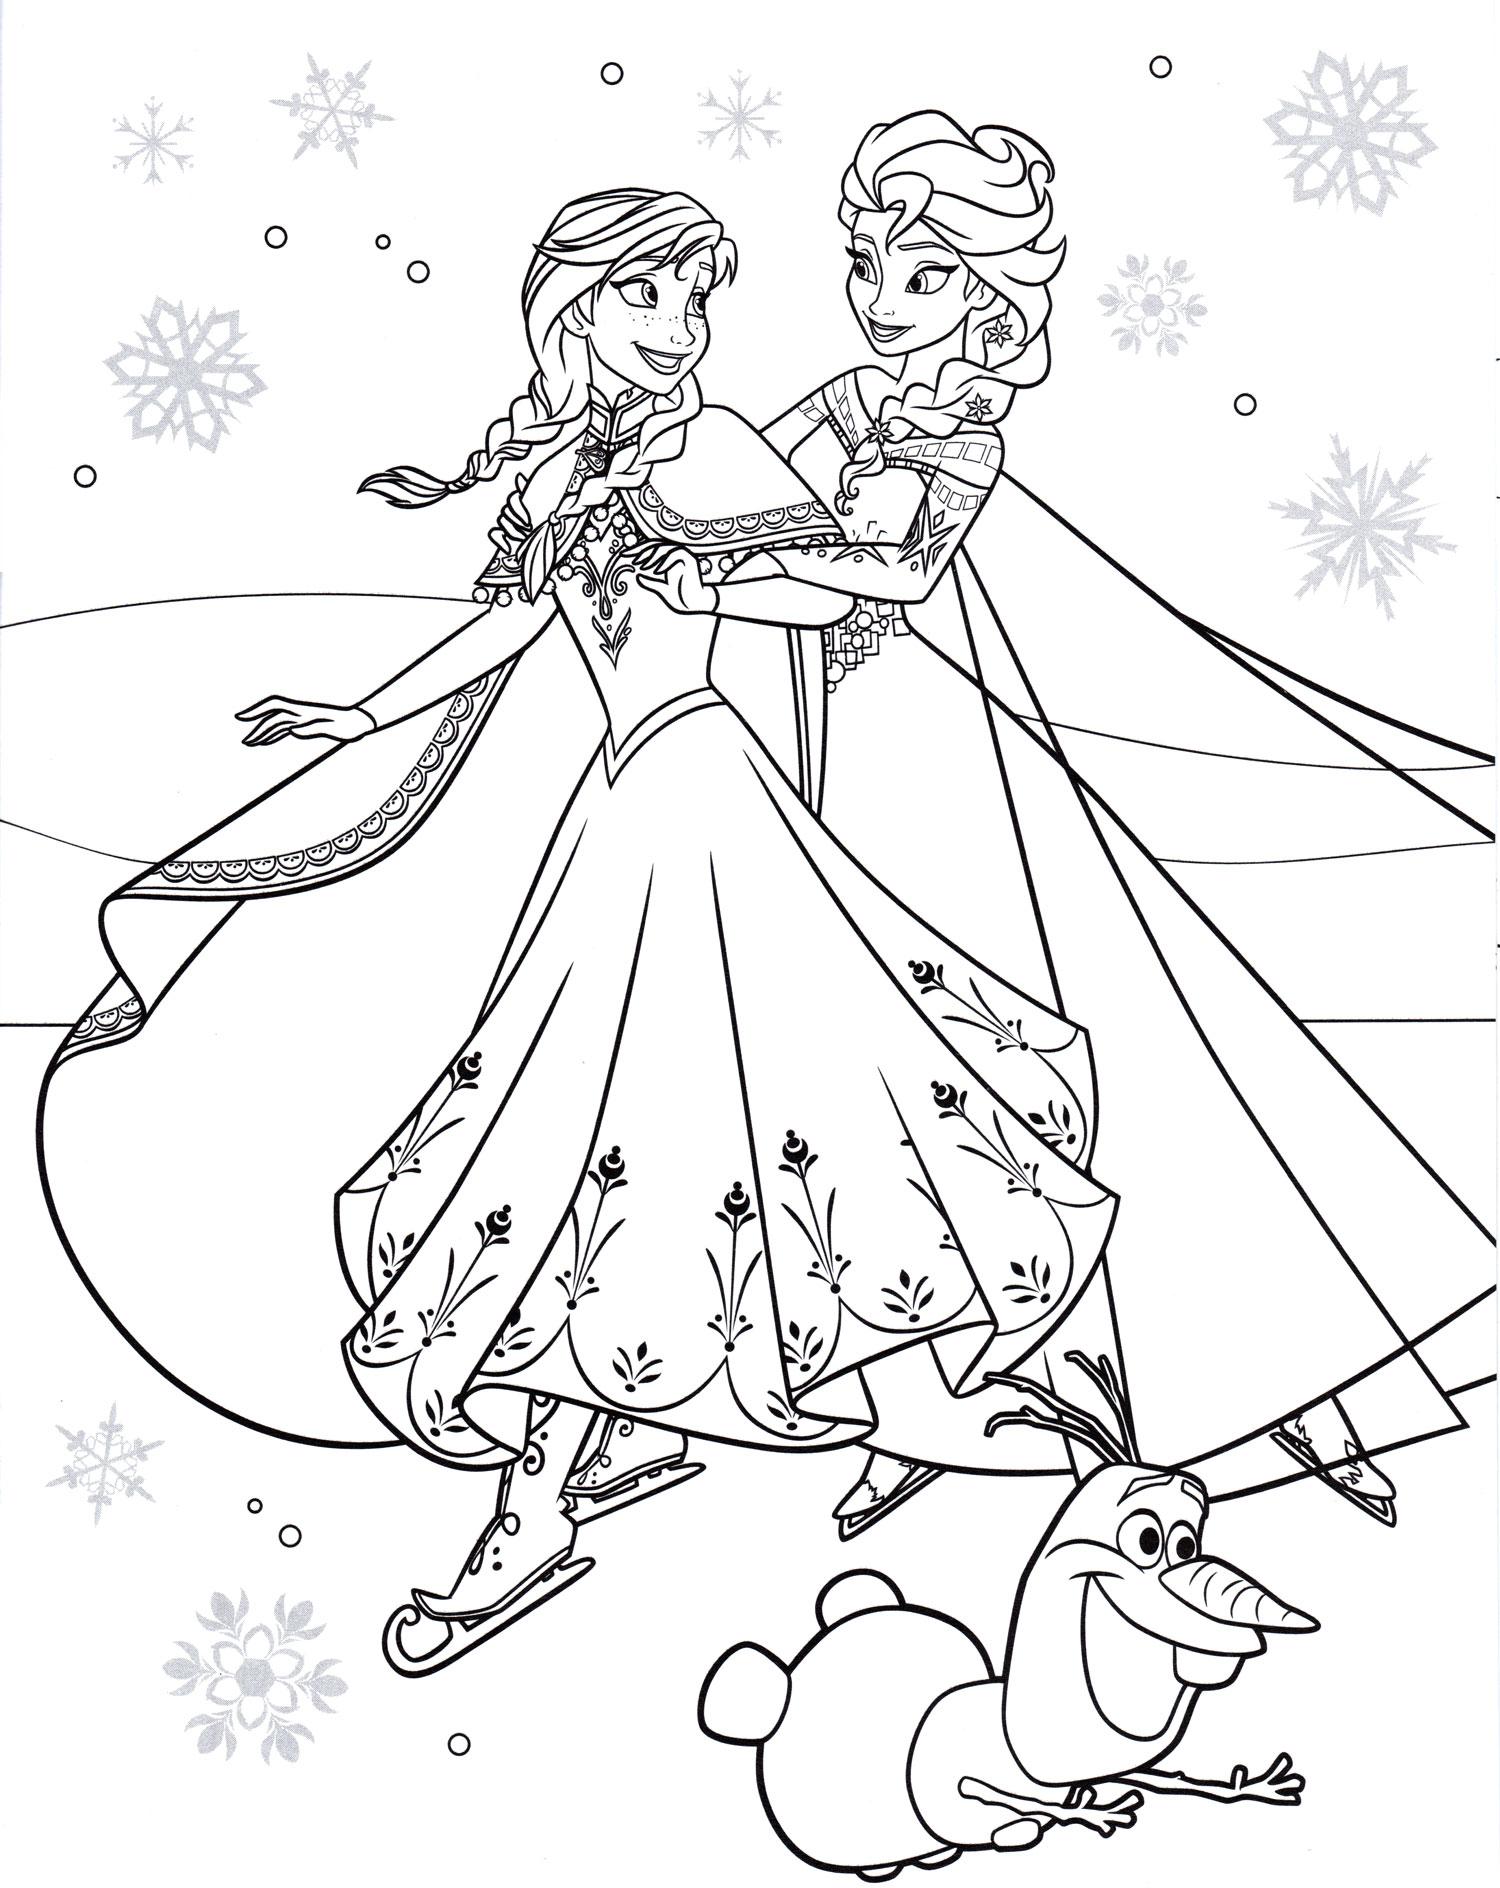 Раскраска Эльза и Анна на коньках